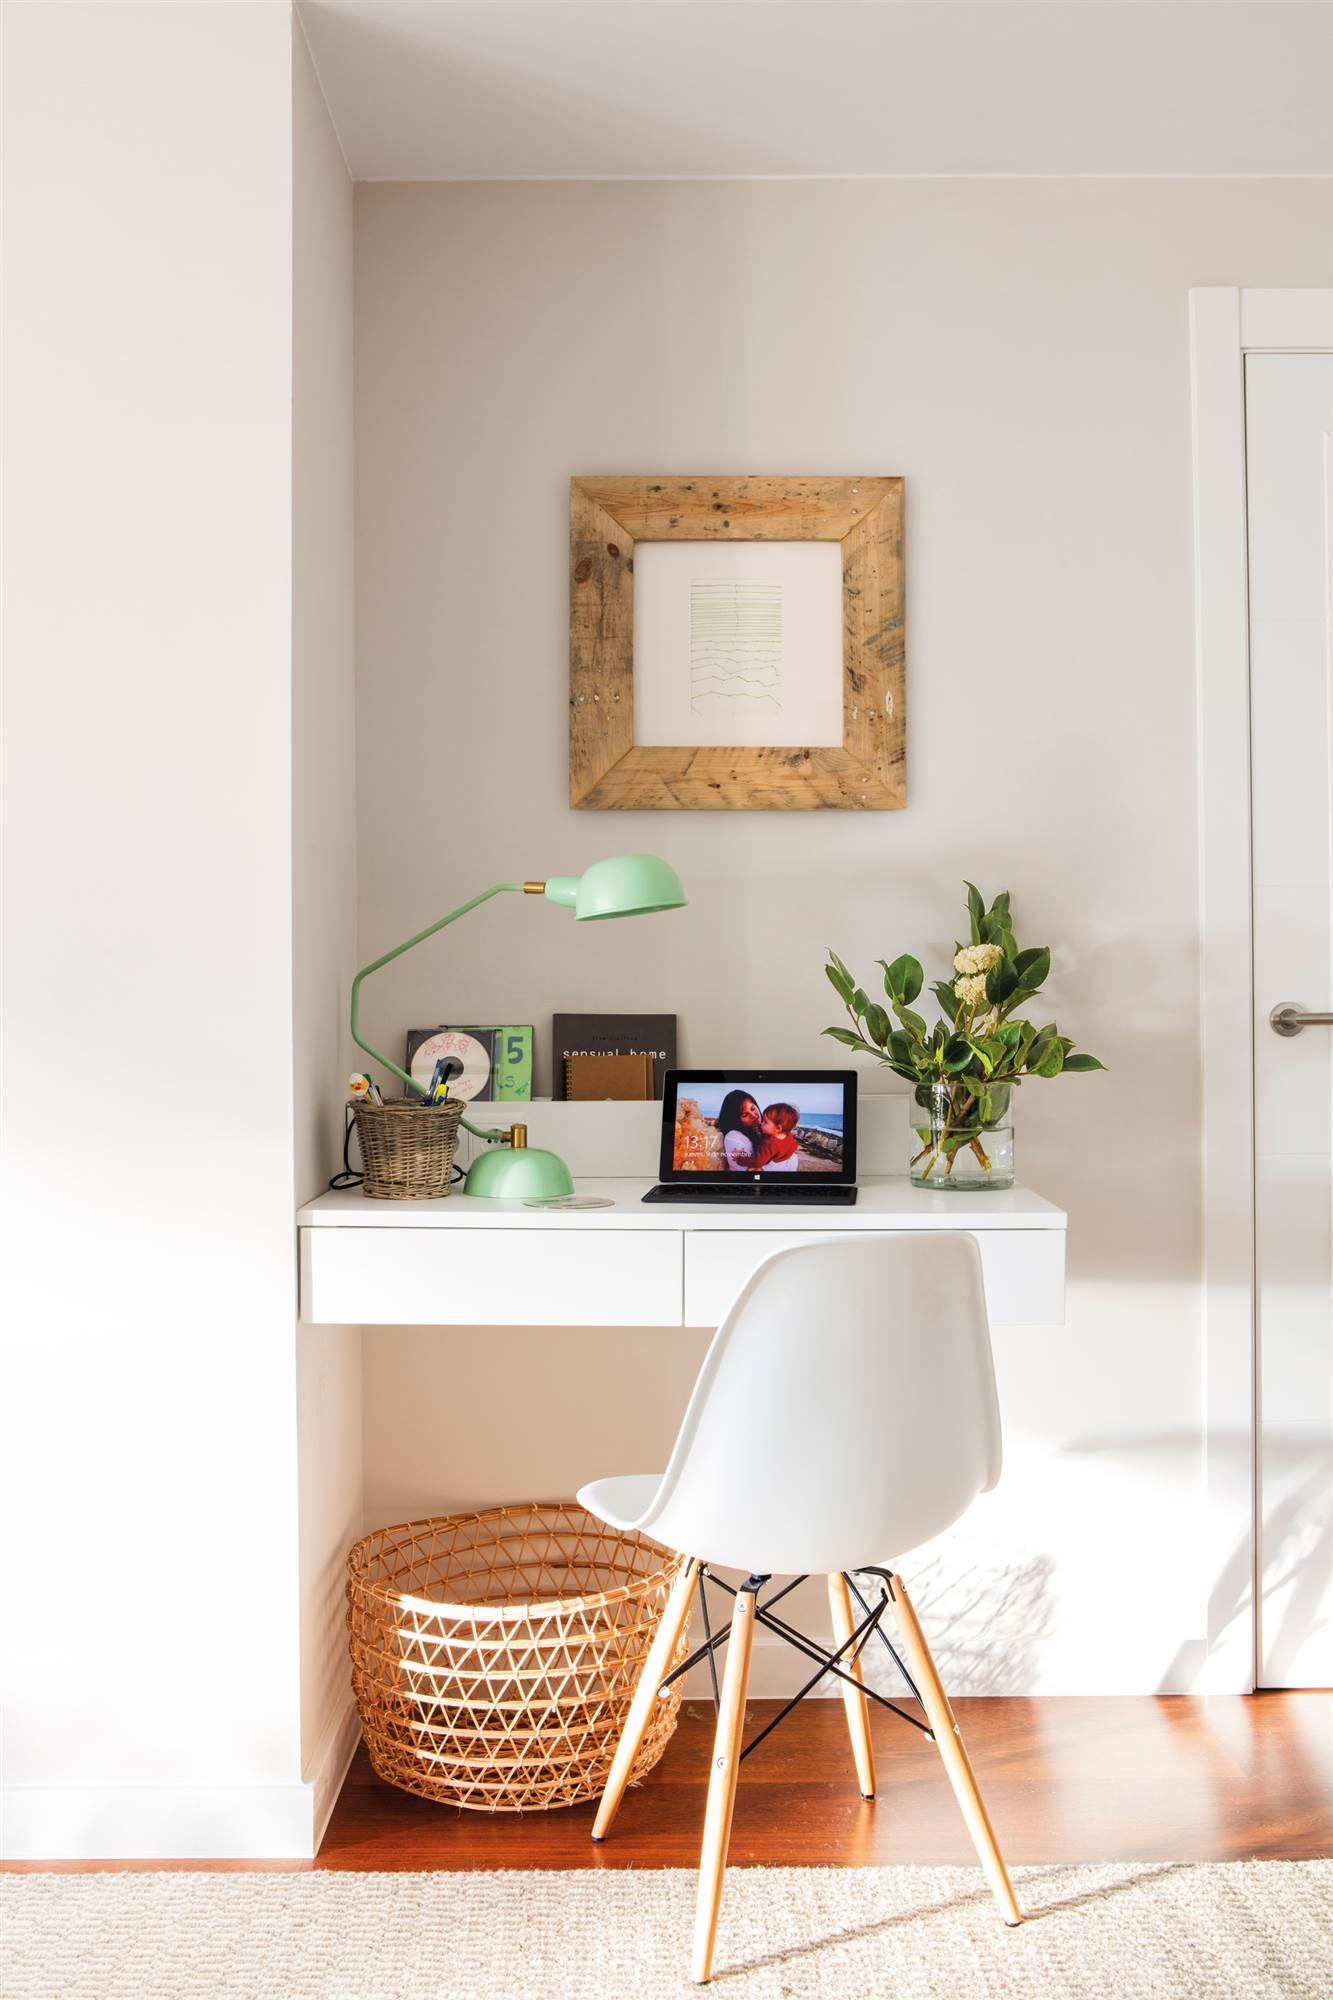 Muebles para espacios peque os - Muebles de entrada pequenos ...